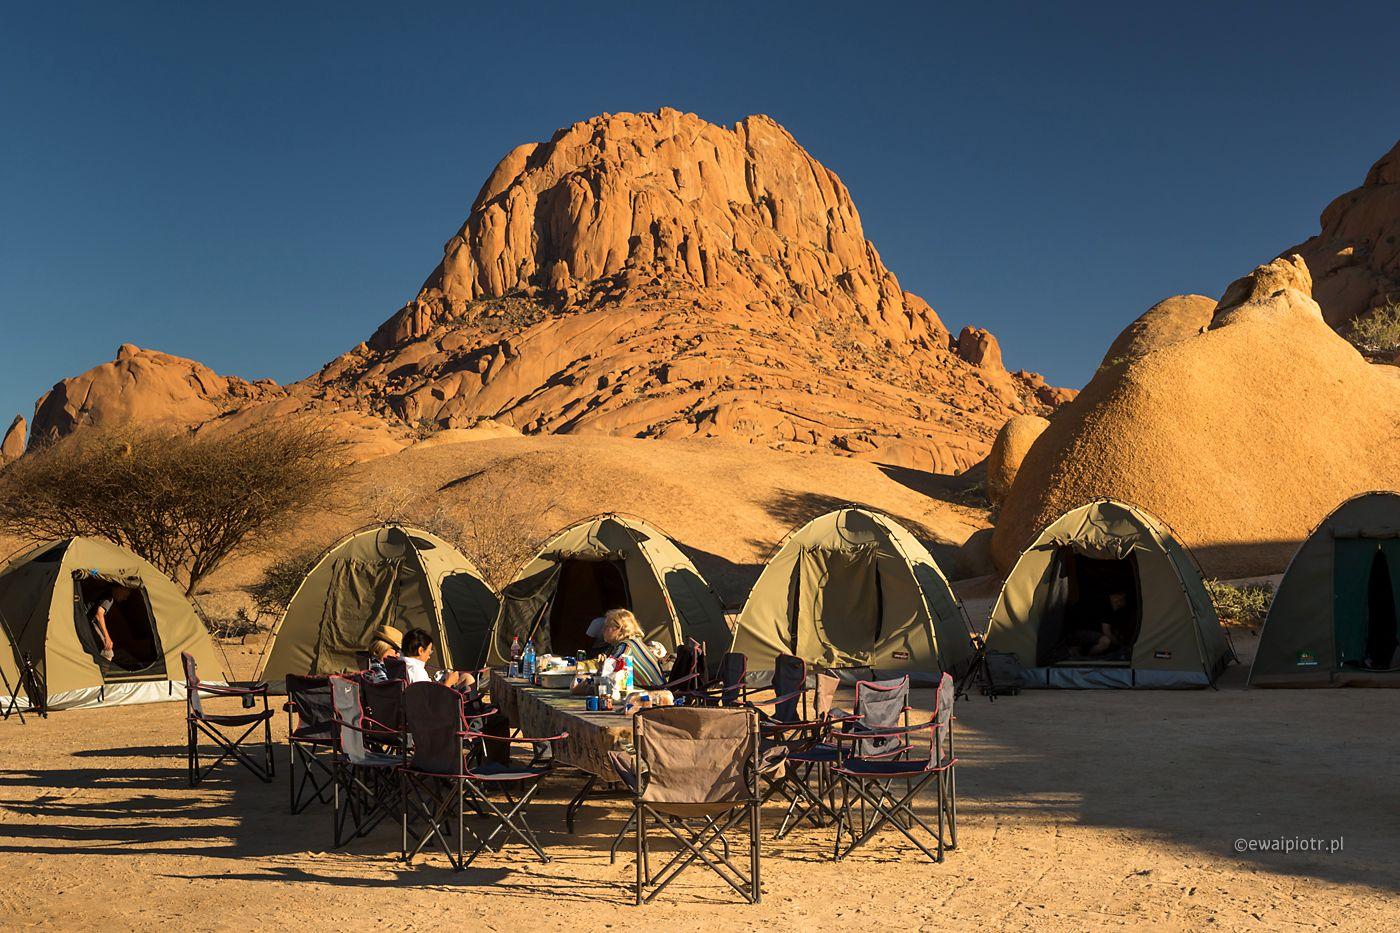 Obóz pod Spitzkoppe, Namibia